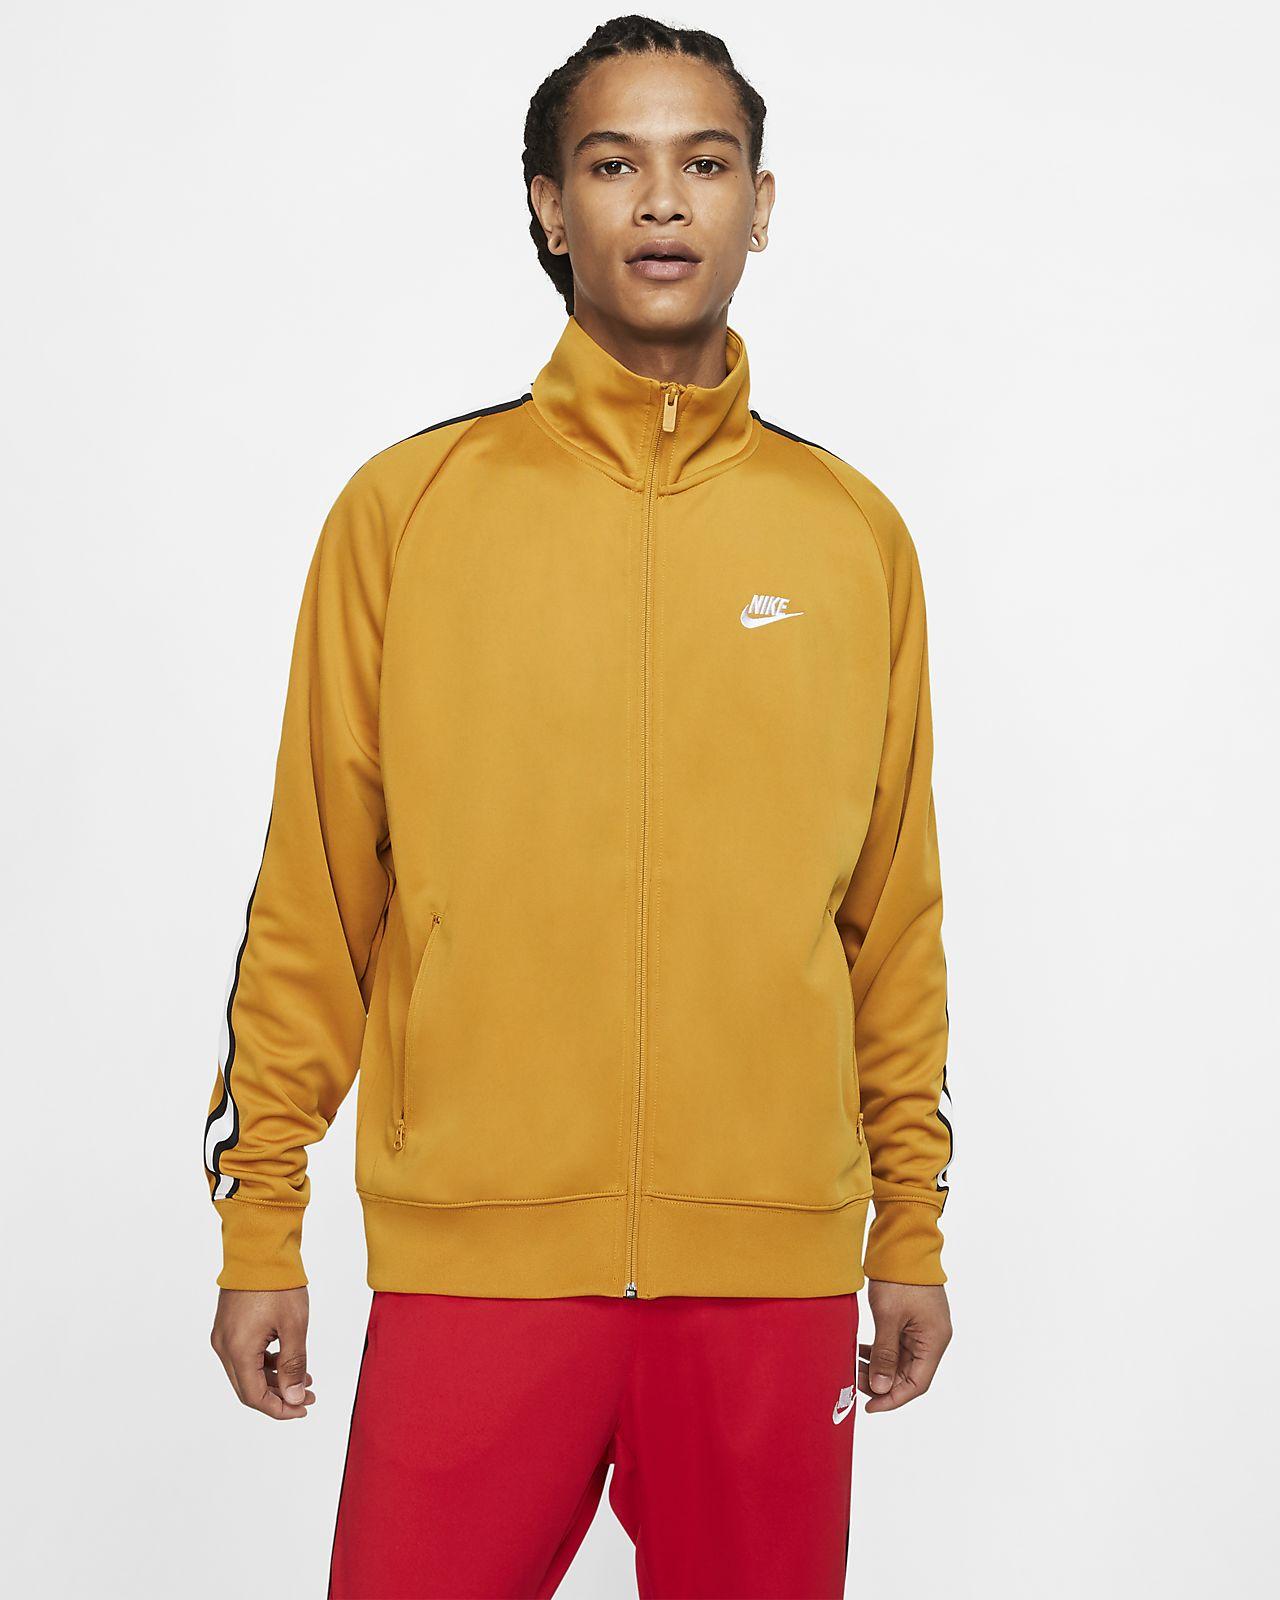 Мужская трикотажная куртка для разминки Nike Sportswear N98